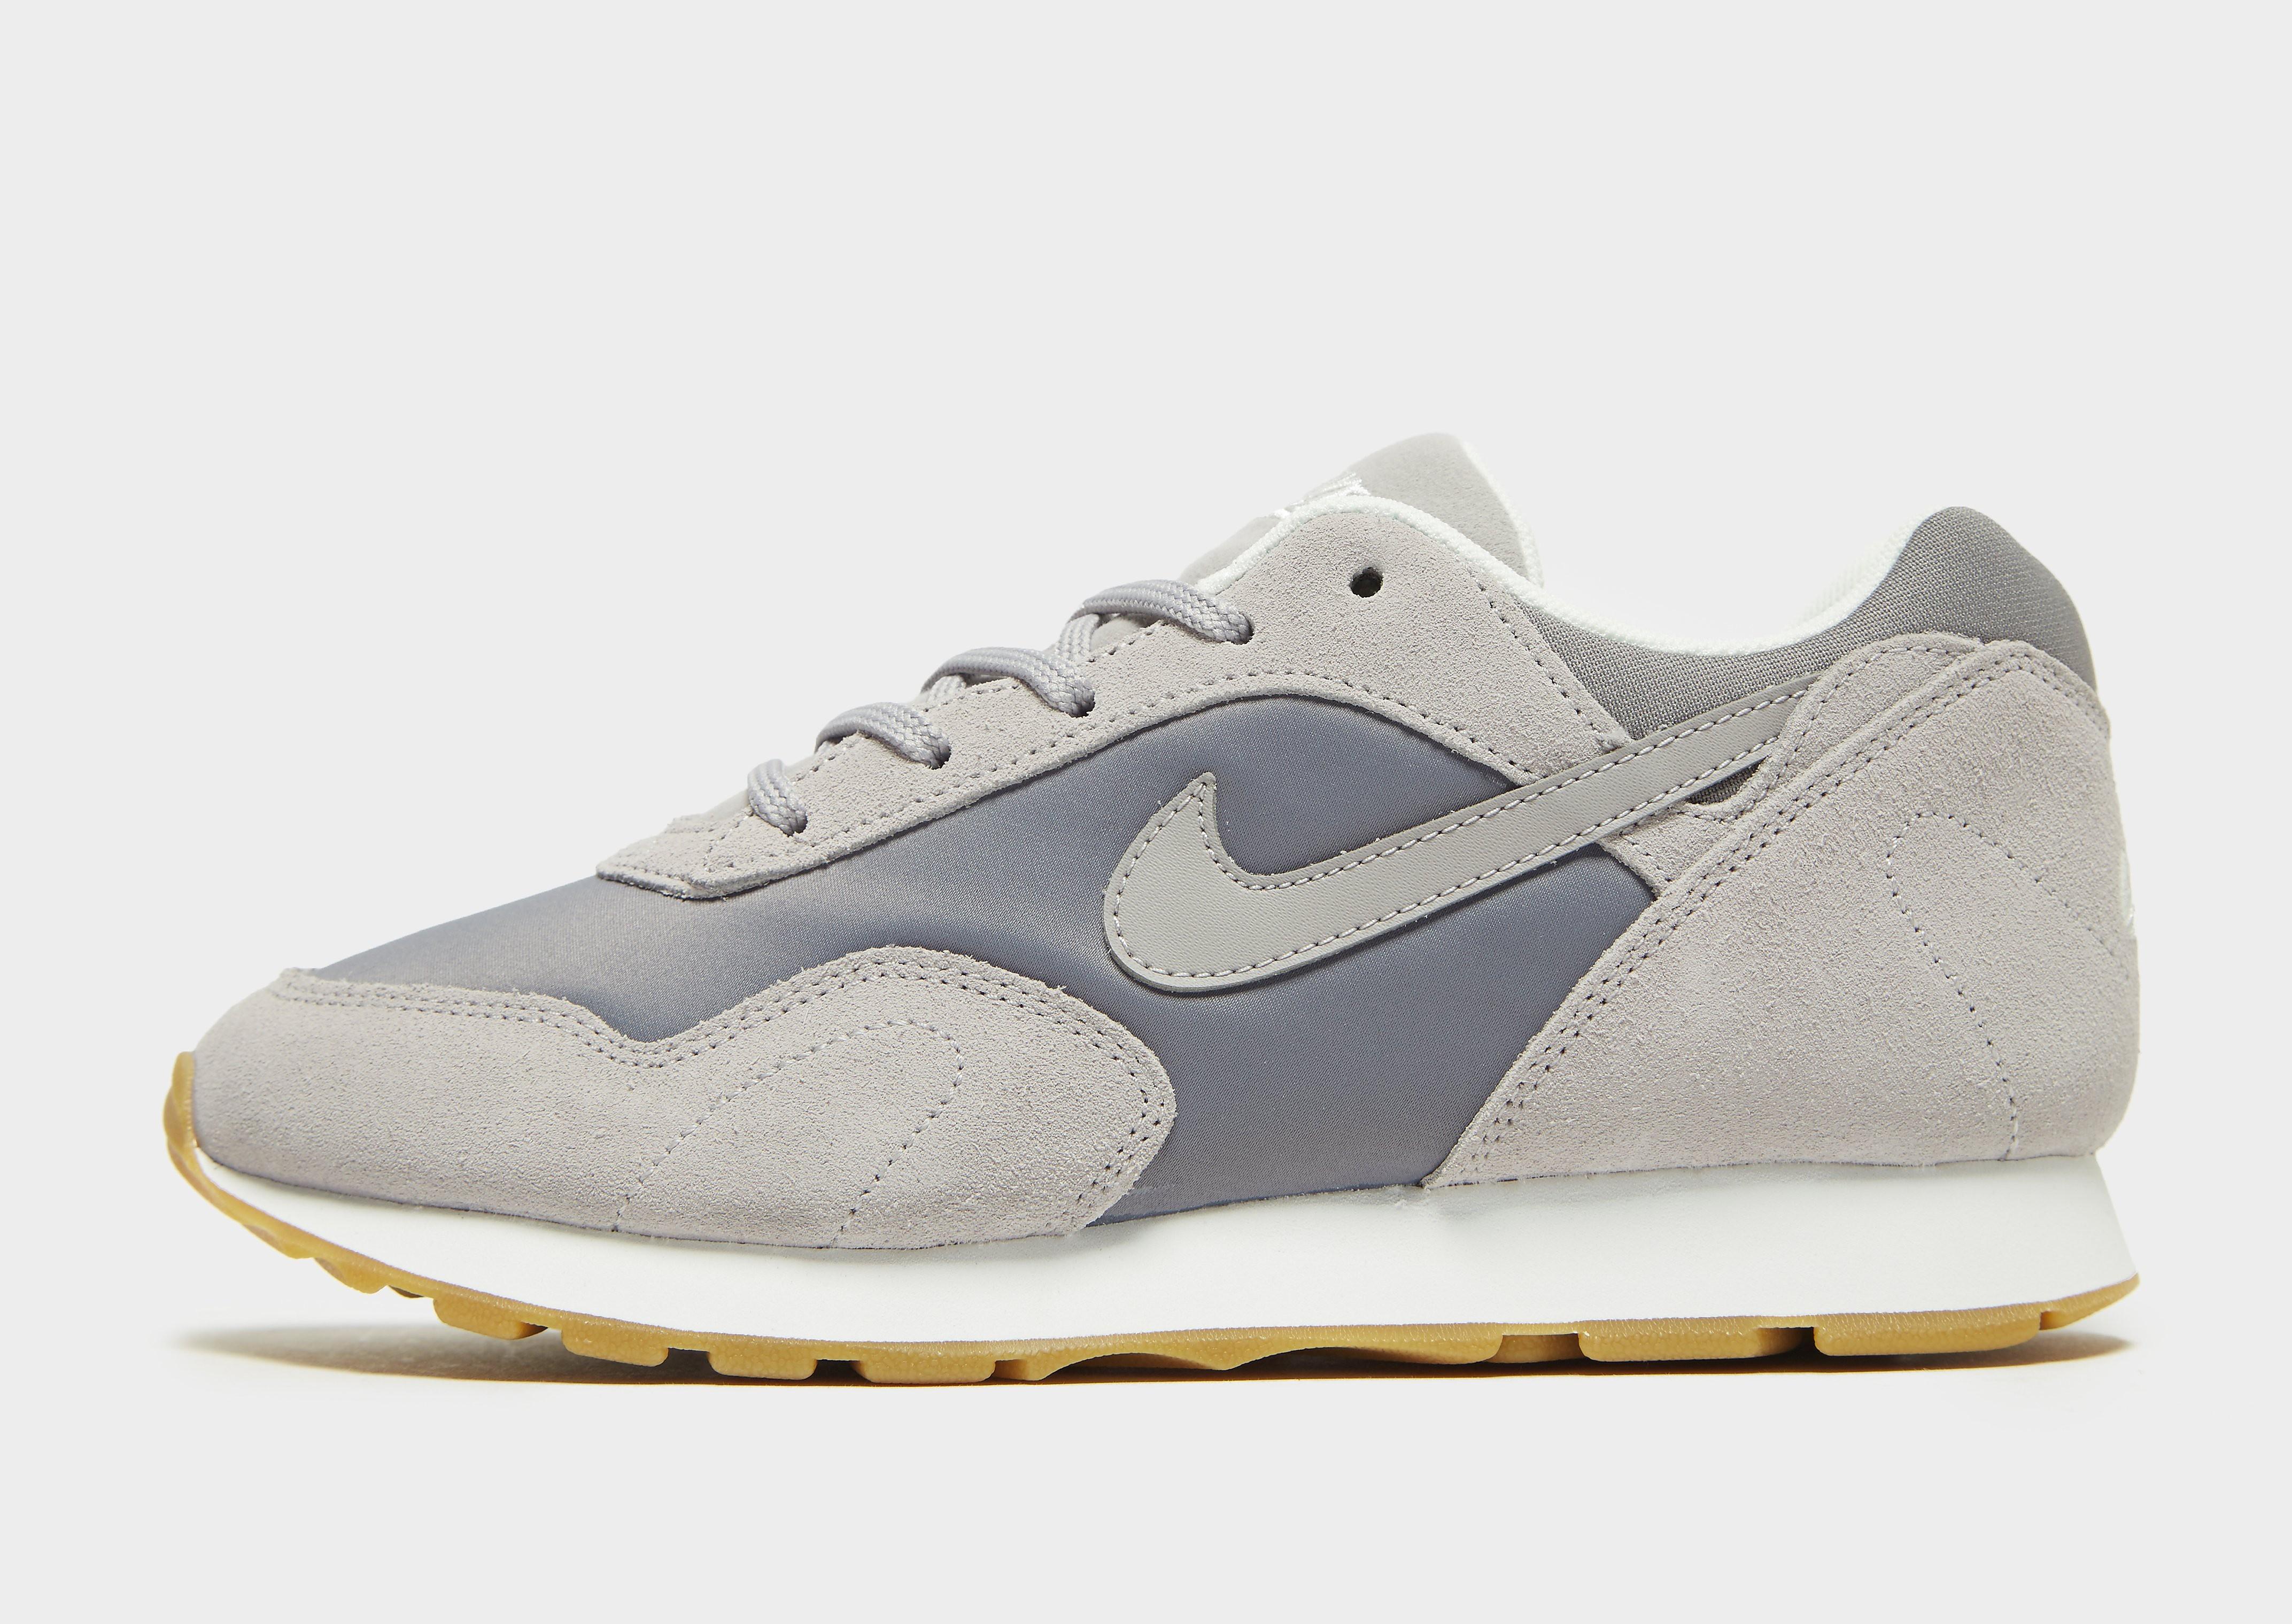 Nike Outburst Dames - Grijs - Dames